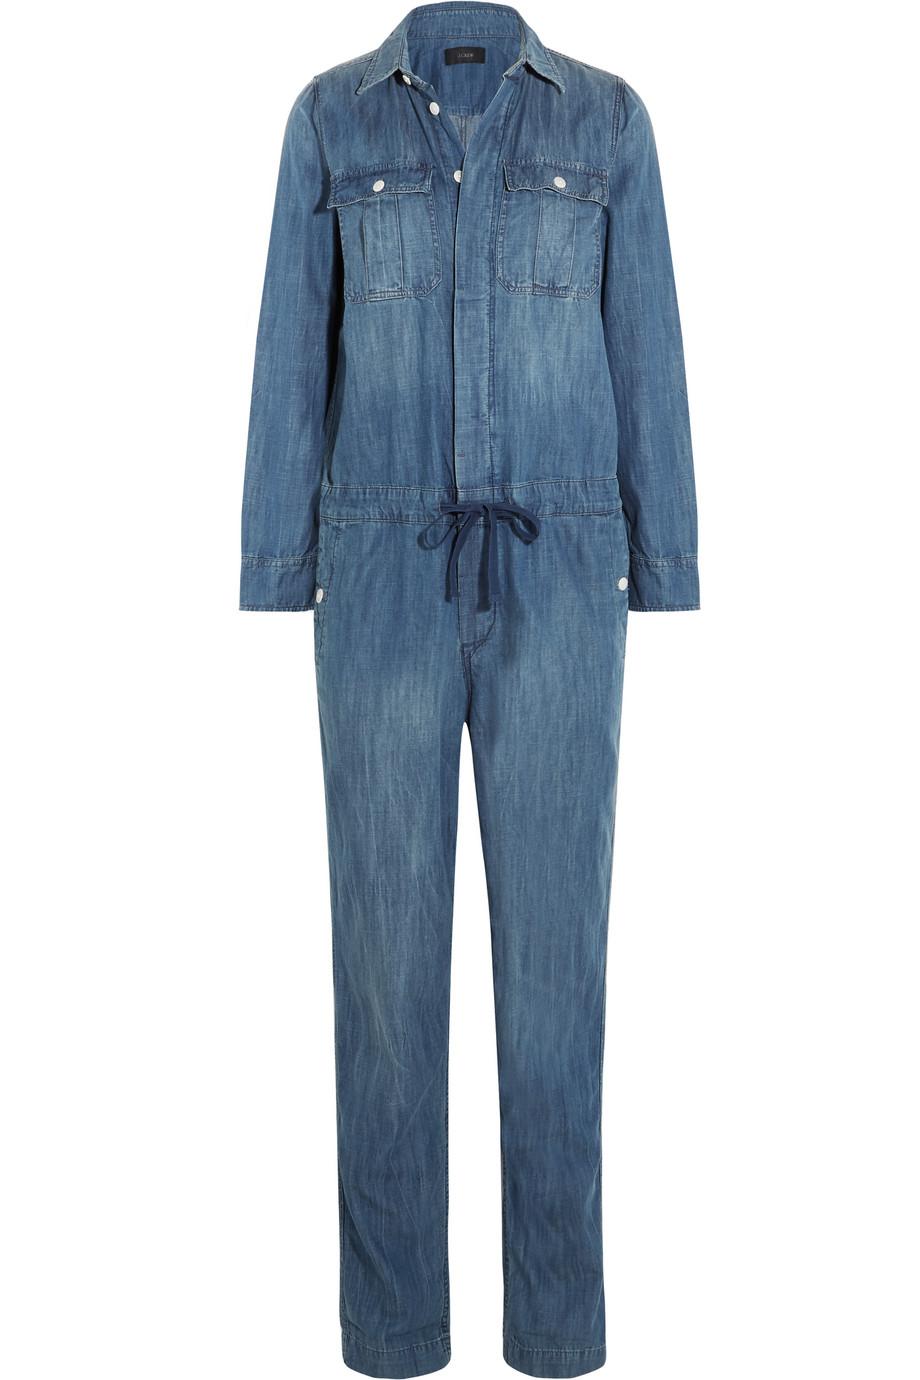 J.Crew Edding Chambray Jumpsuit, Blue, Women's, Size: 0